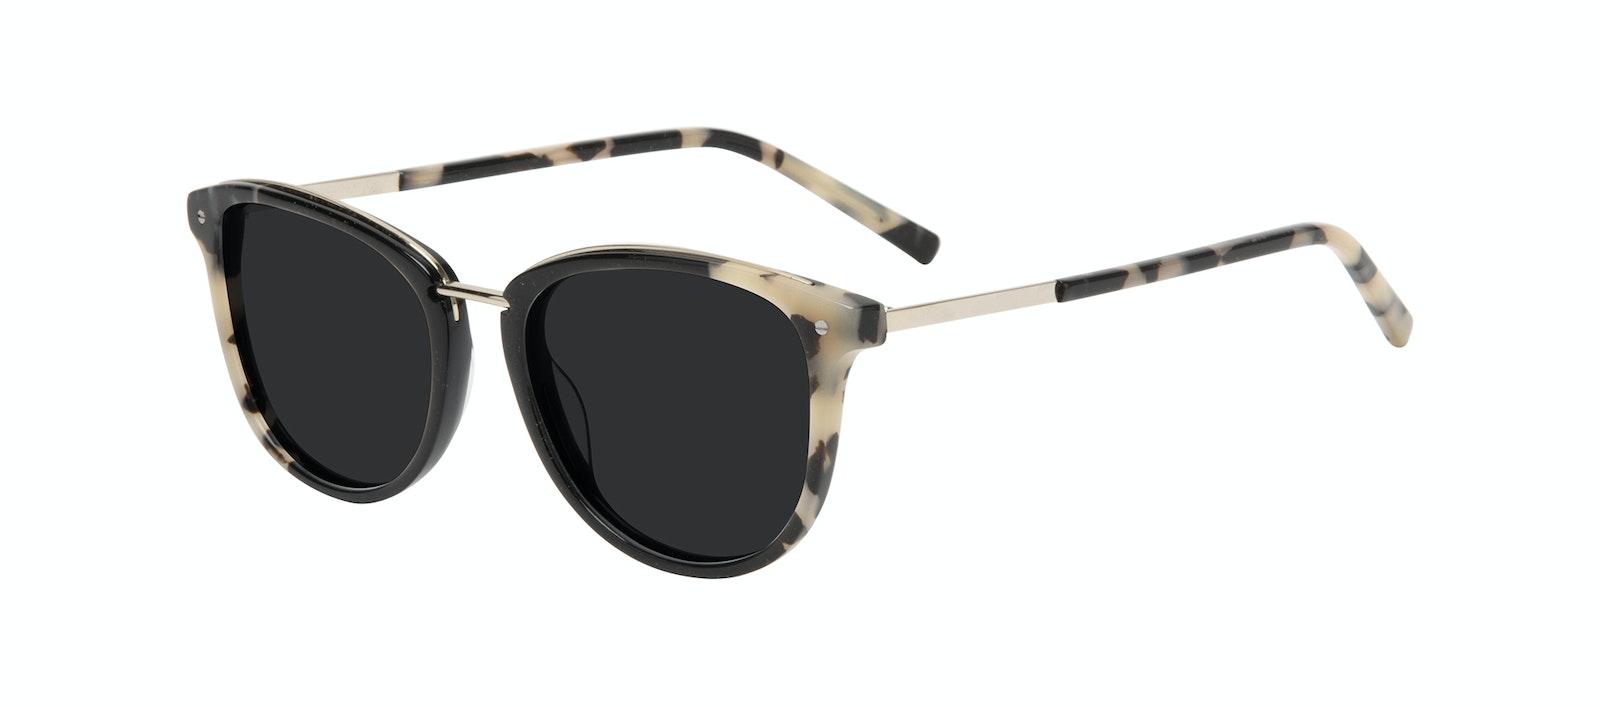 Affordable Fashion Glasses Square Round Sunglasses Women Bella Ebony Granite Tilt